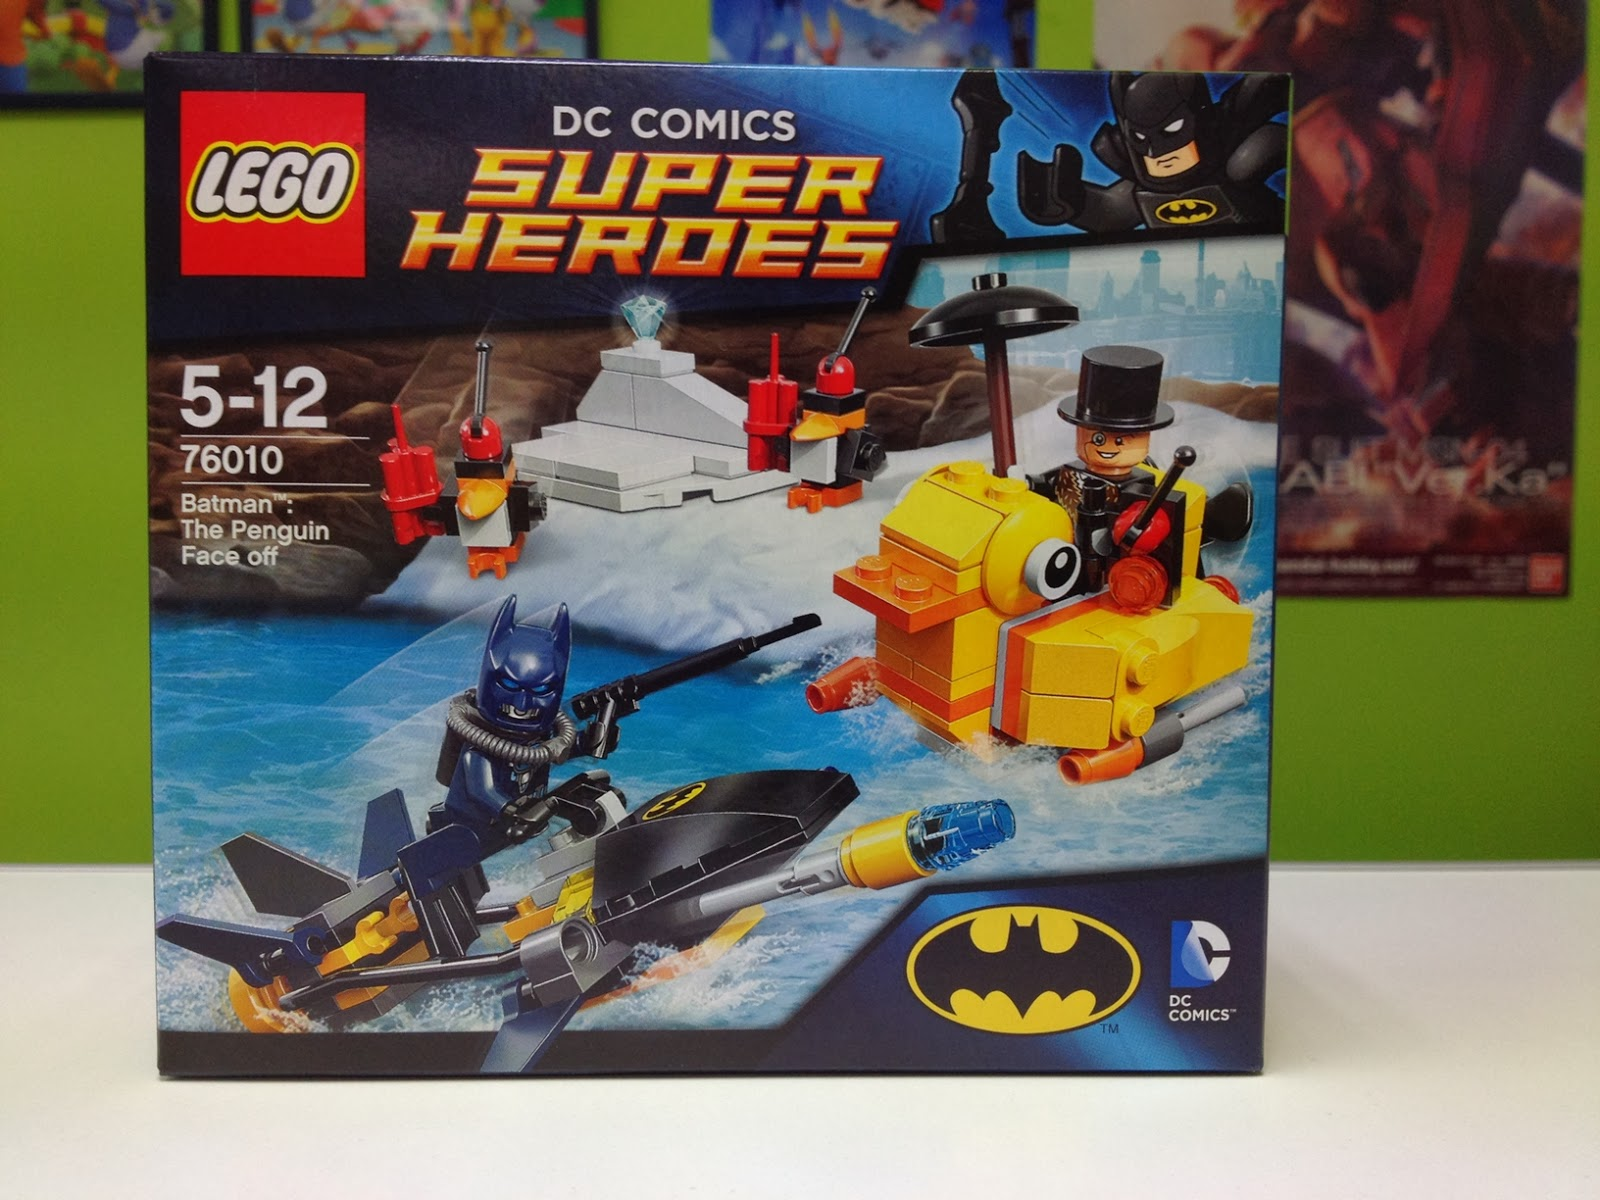 Lego Batman Sets 2014: DeToyz Shop: 2014 Lego Superheroes Batman Sets Arrived